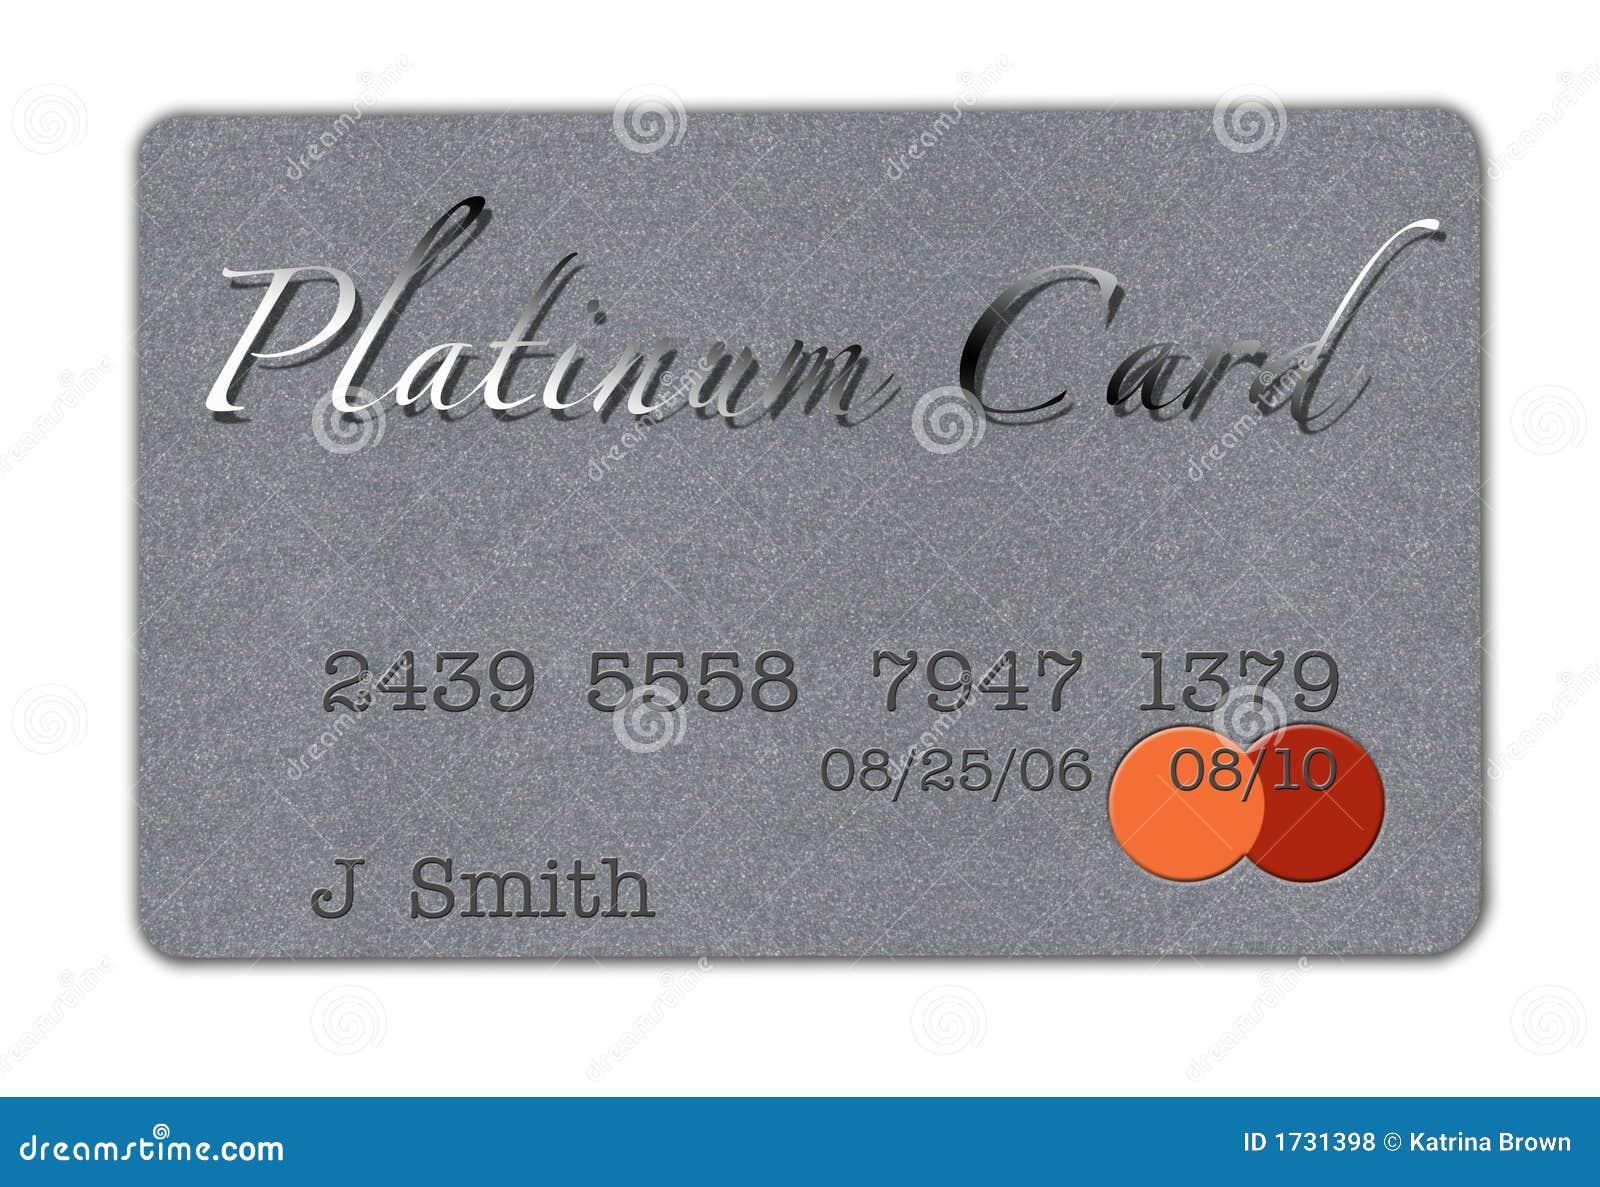 Platinum Credit Card Royalty Free Stock Photos Image